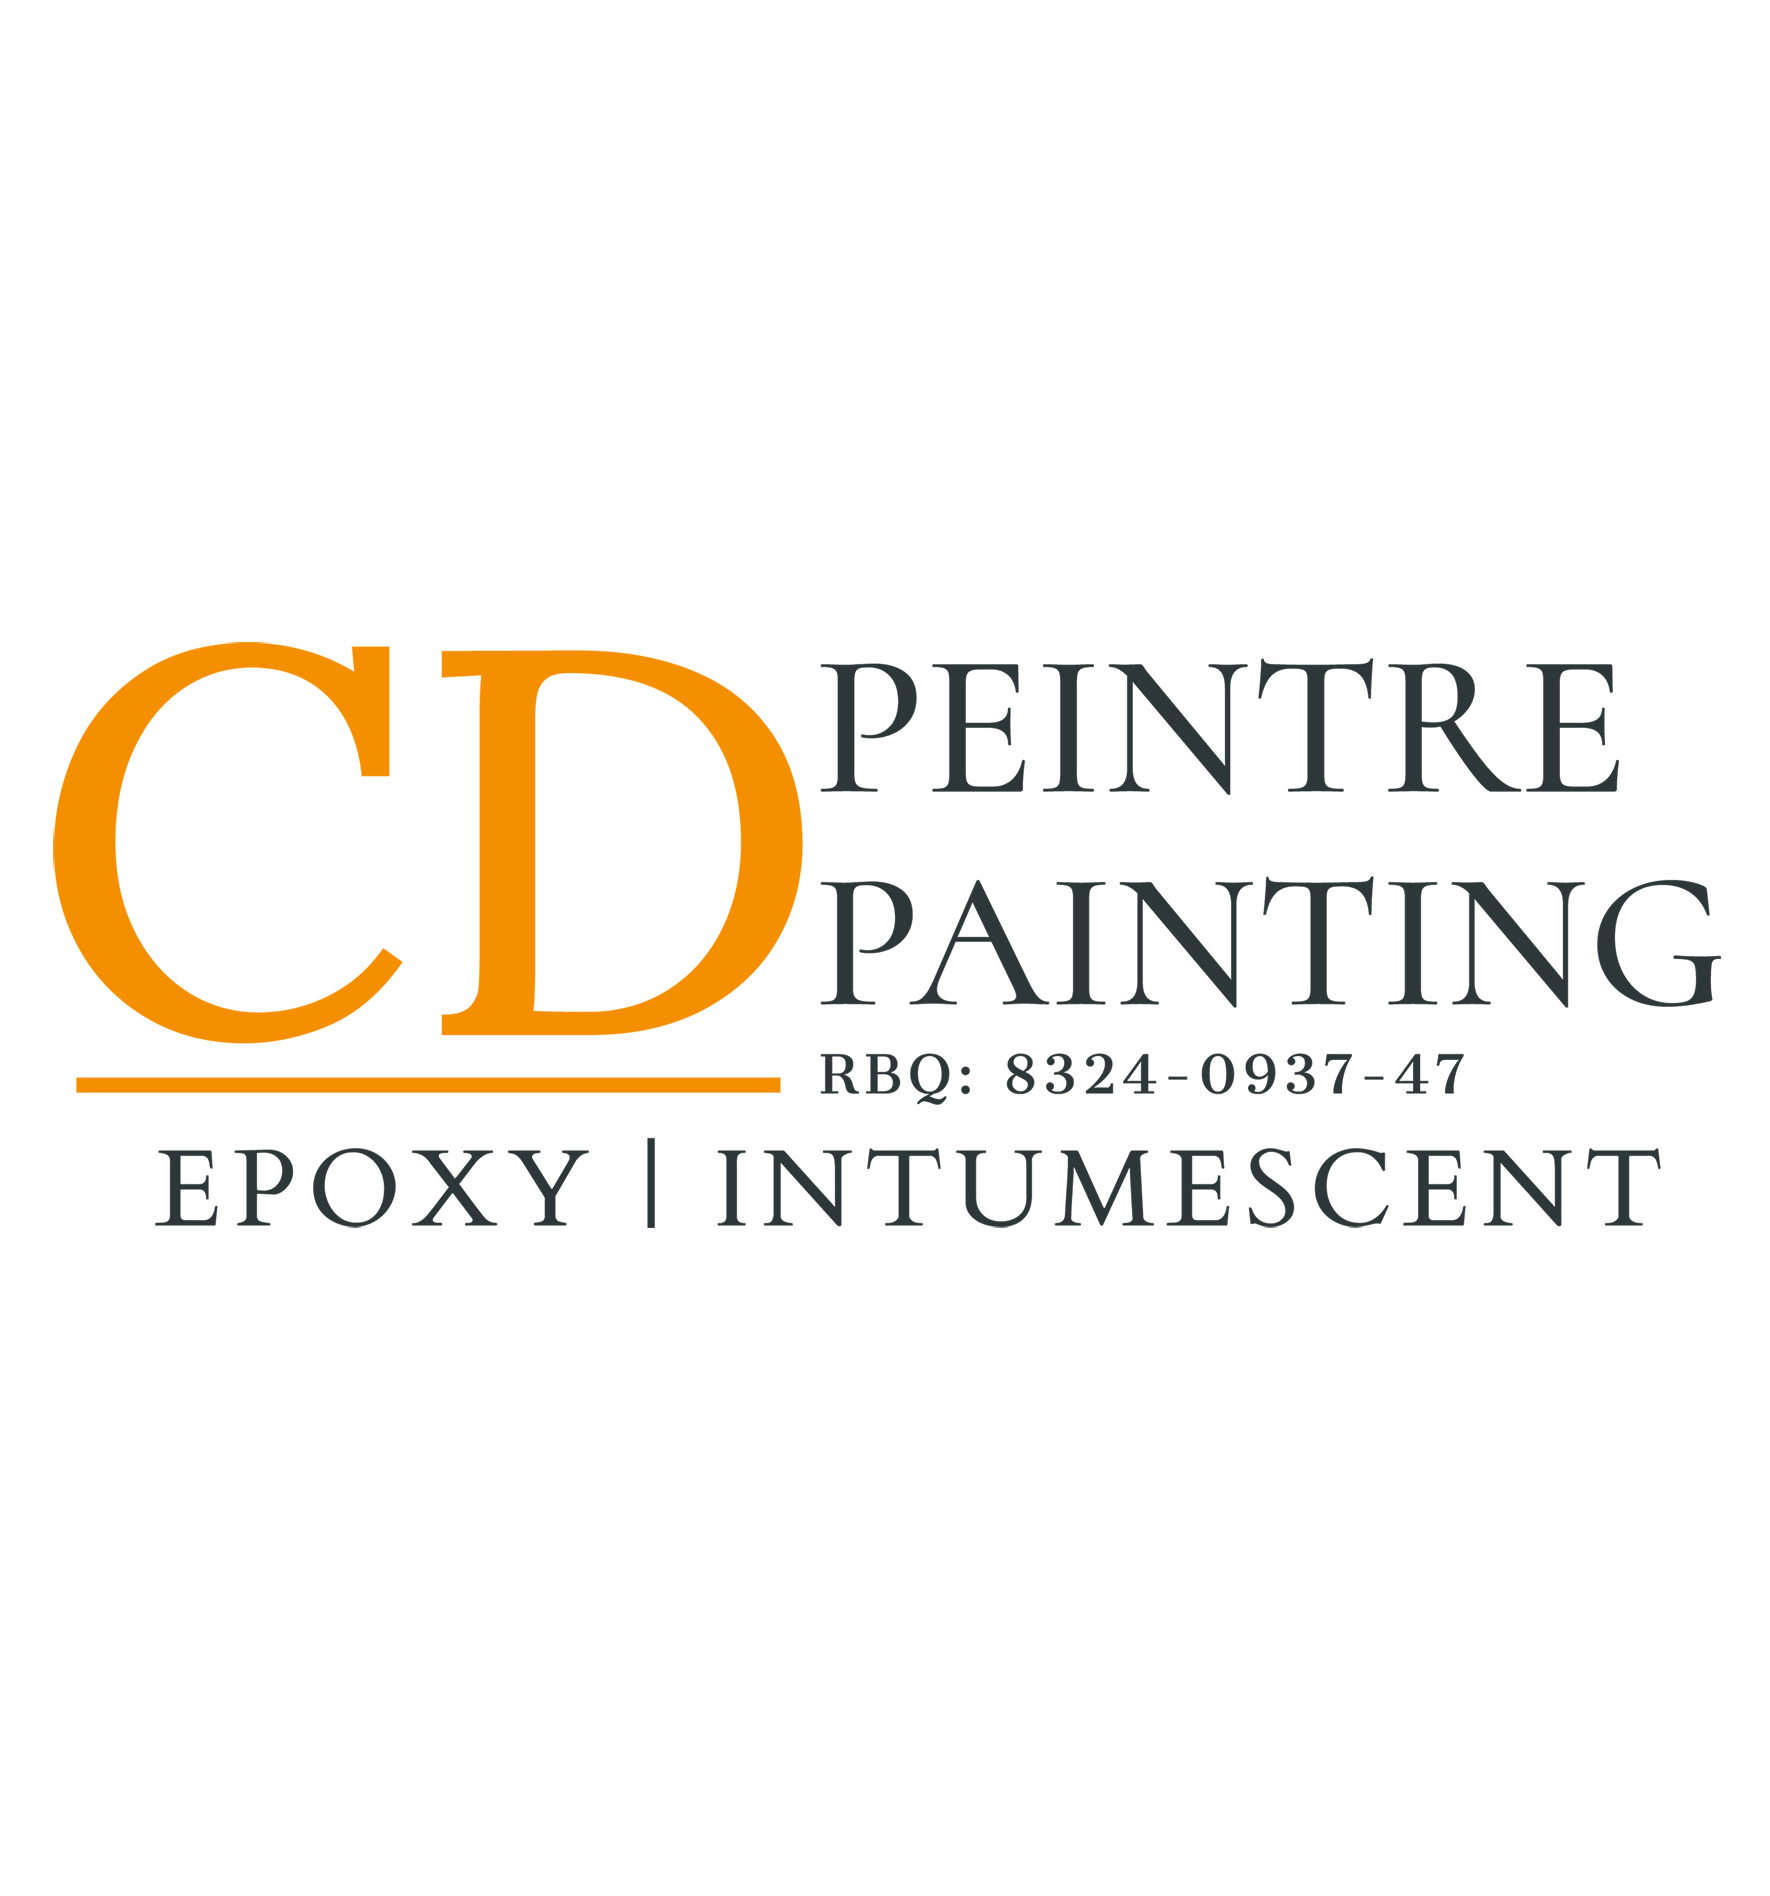 CDpeintre_eps